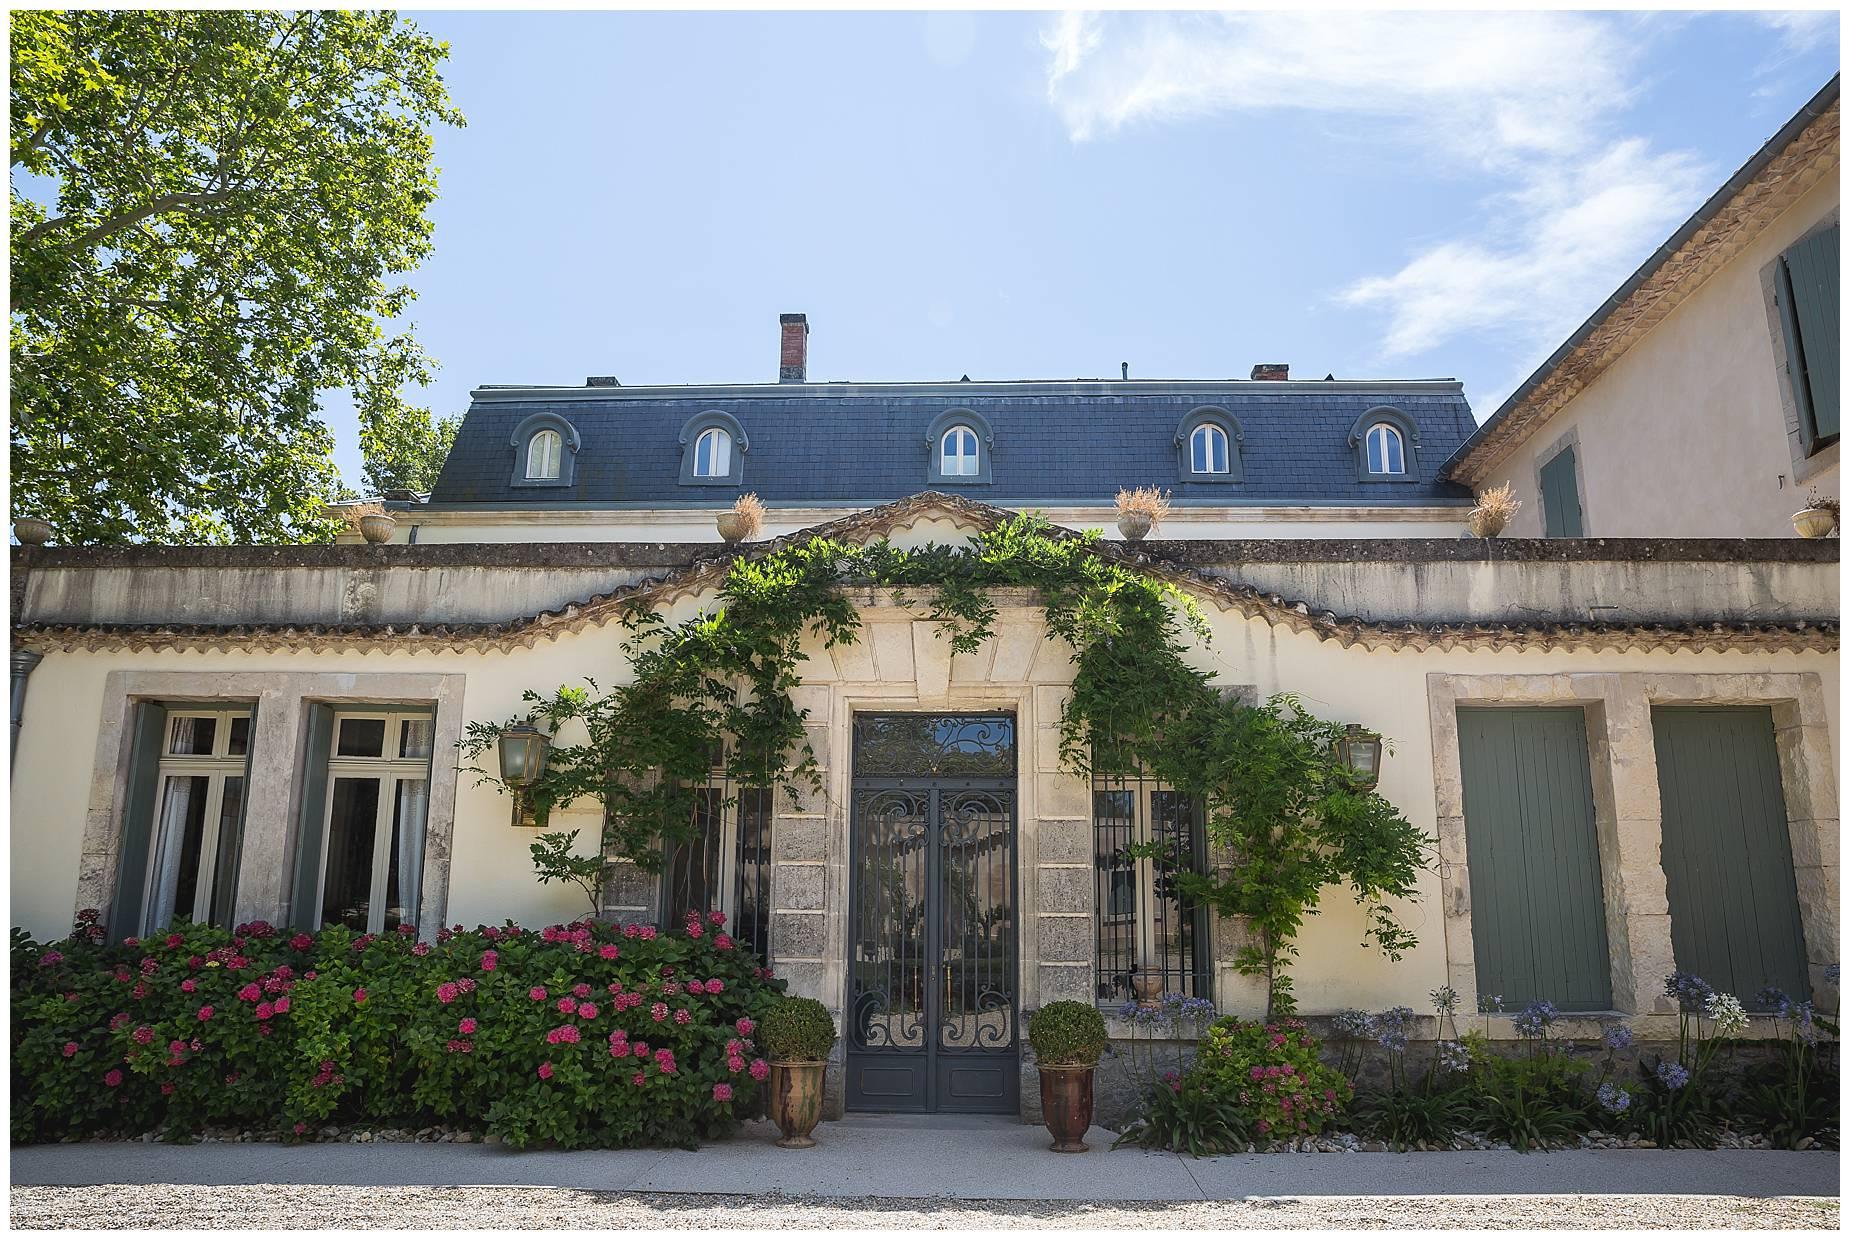 Chateau de Malmont